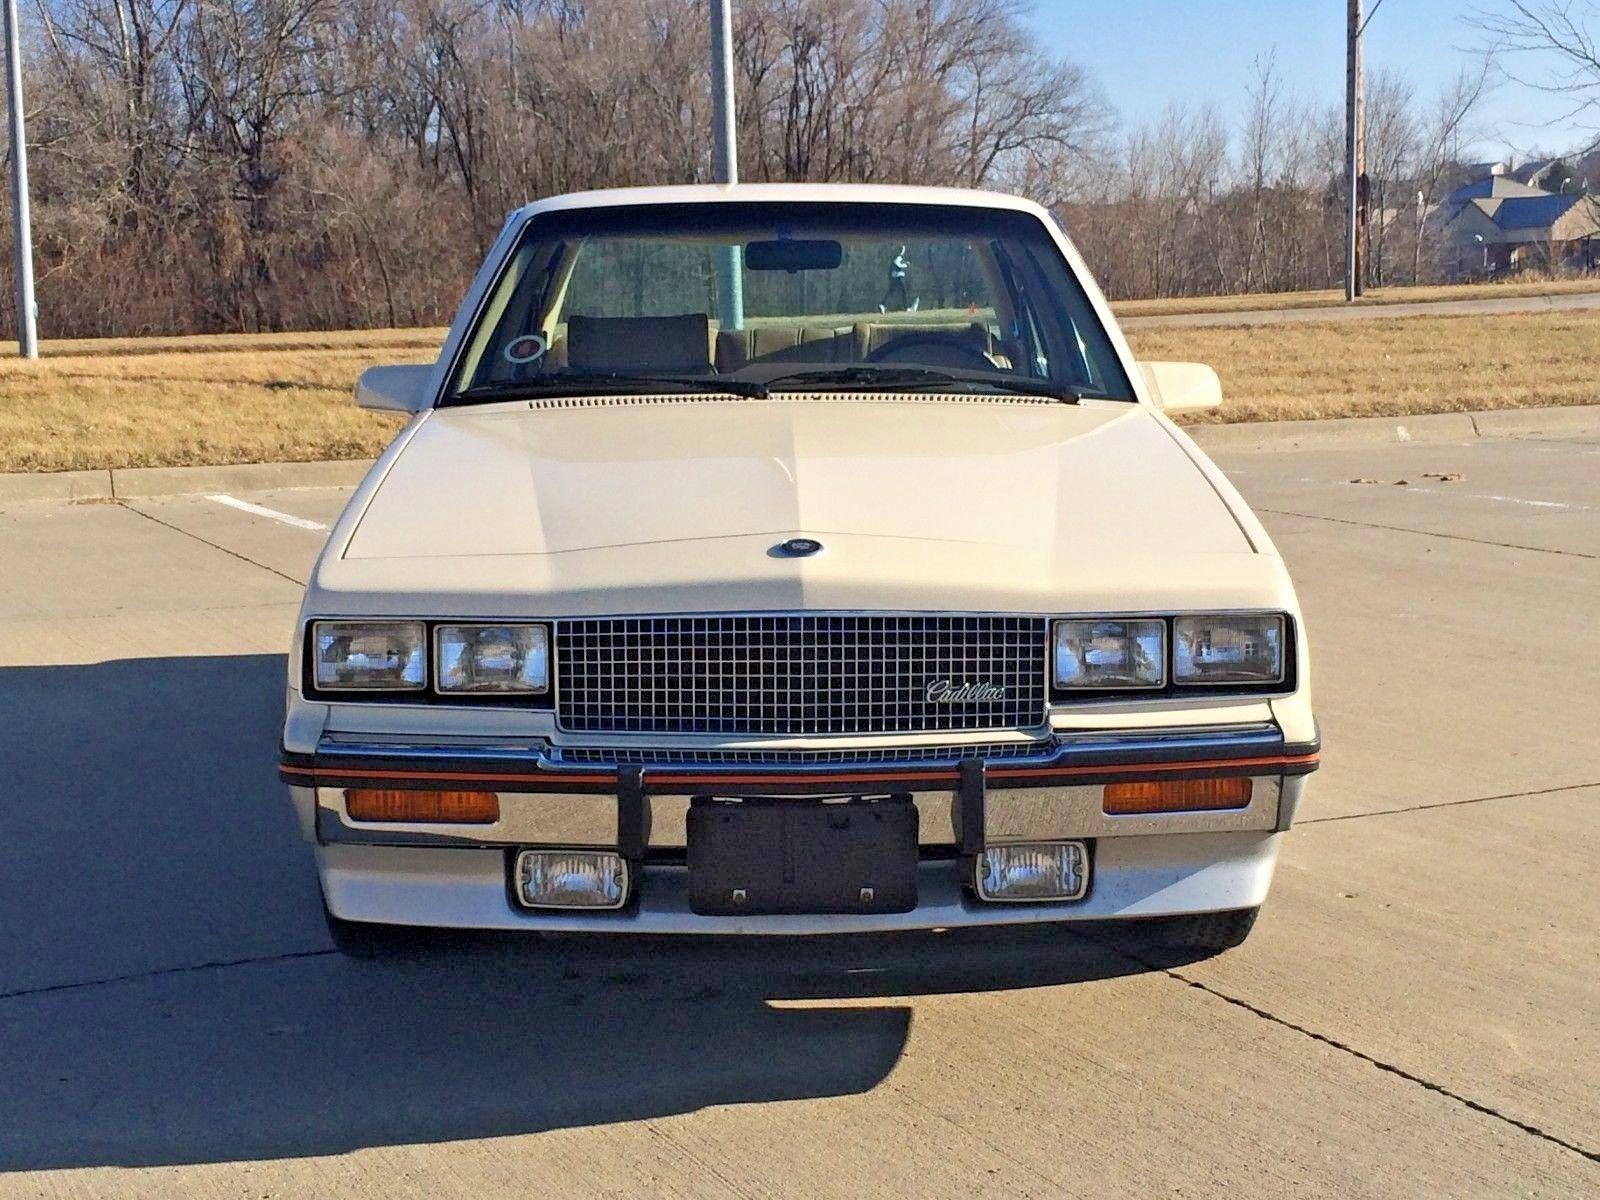 1985 Cadillac Cimarron front